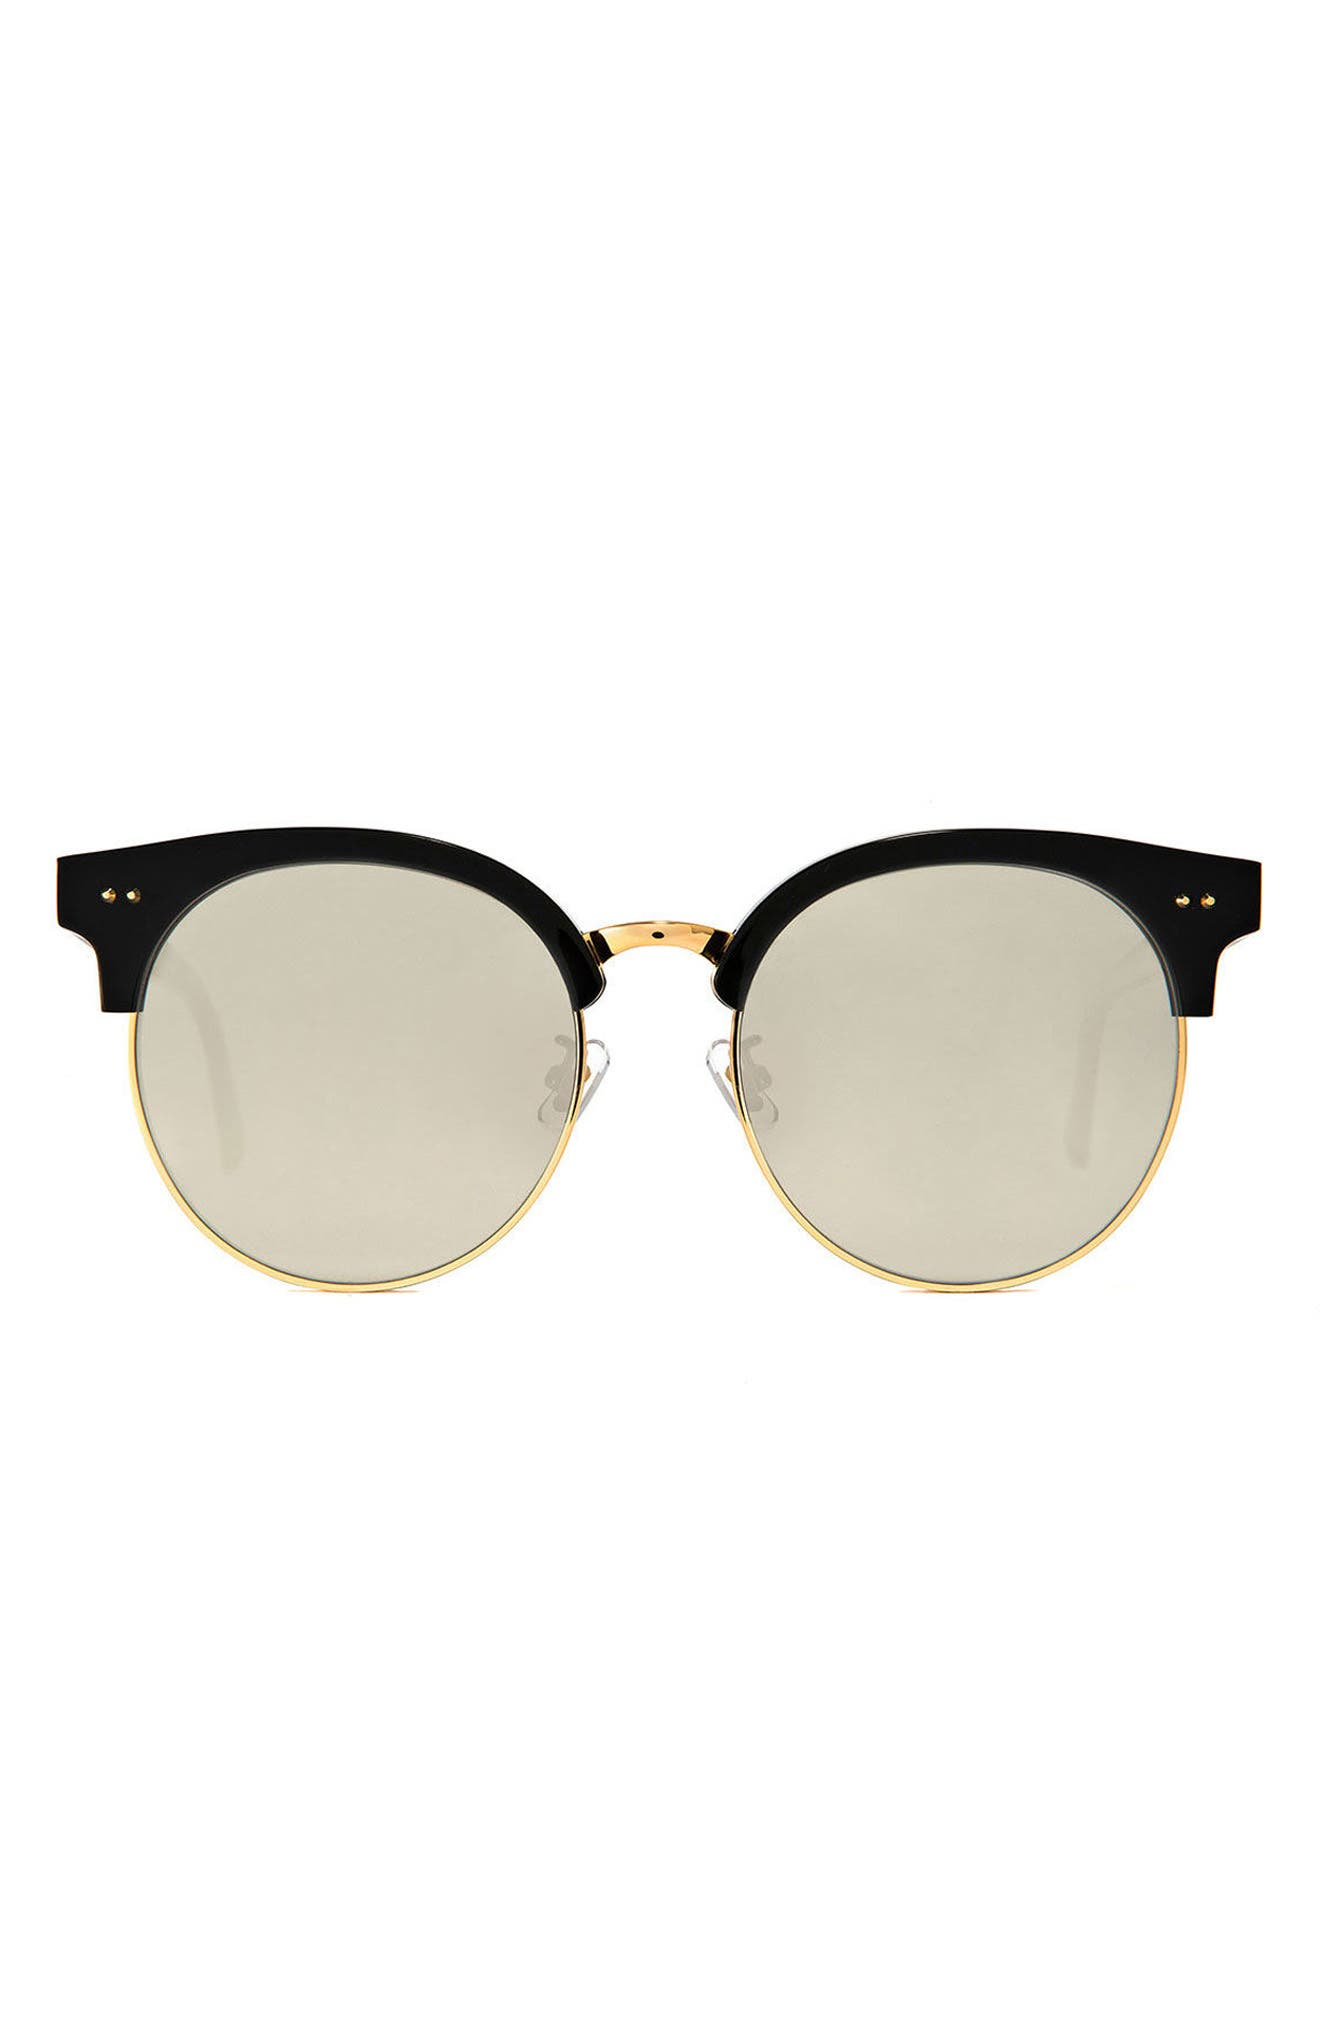 Main Image - Gentle Monster Moon Cut 55mm Sunglasses